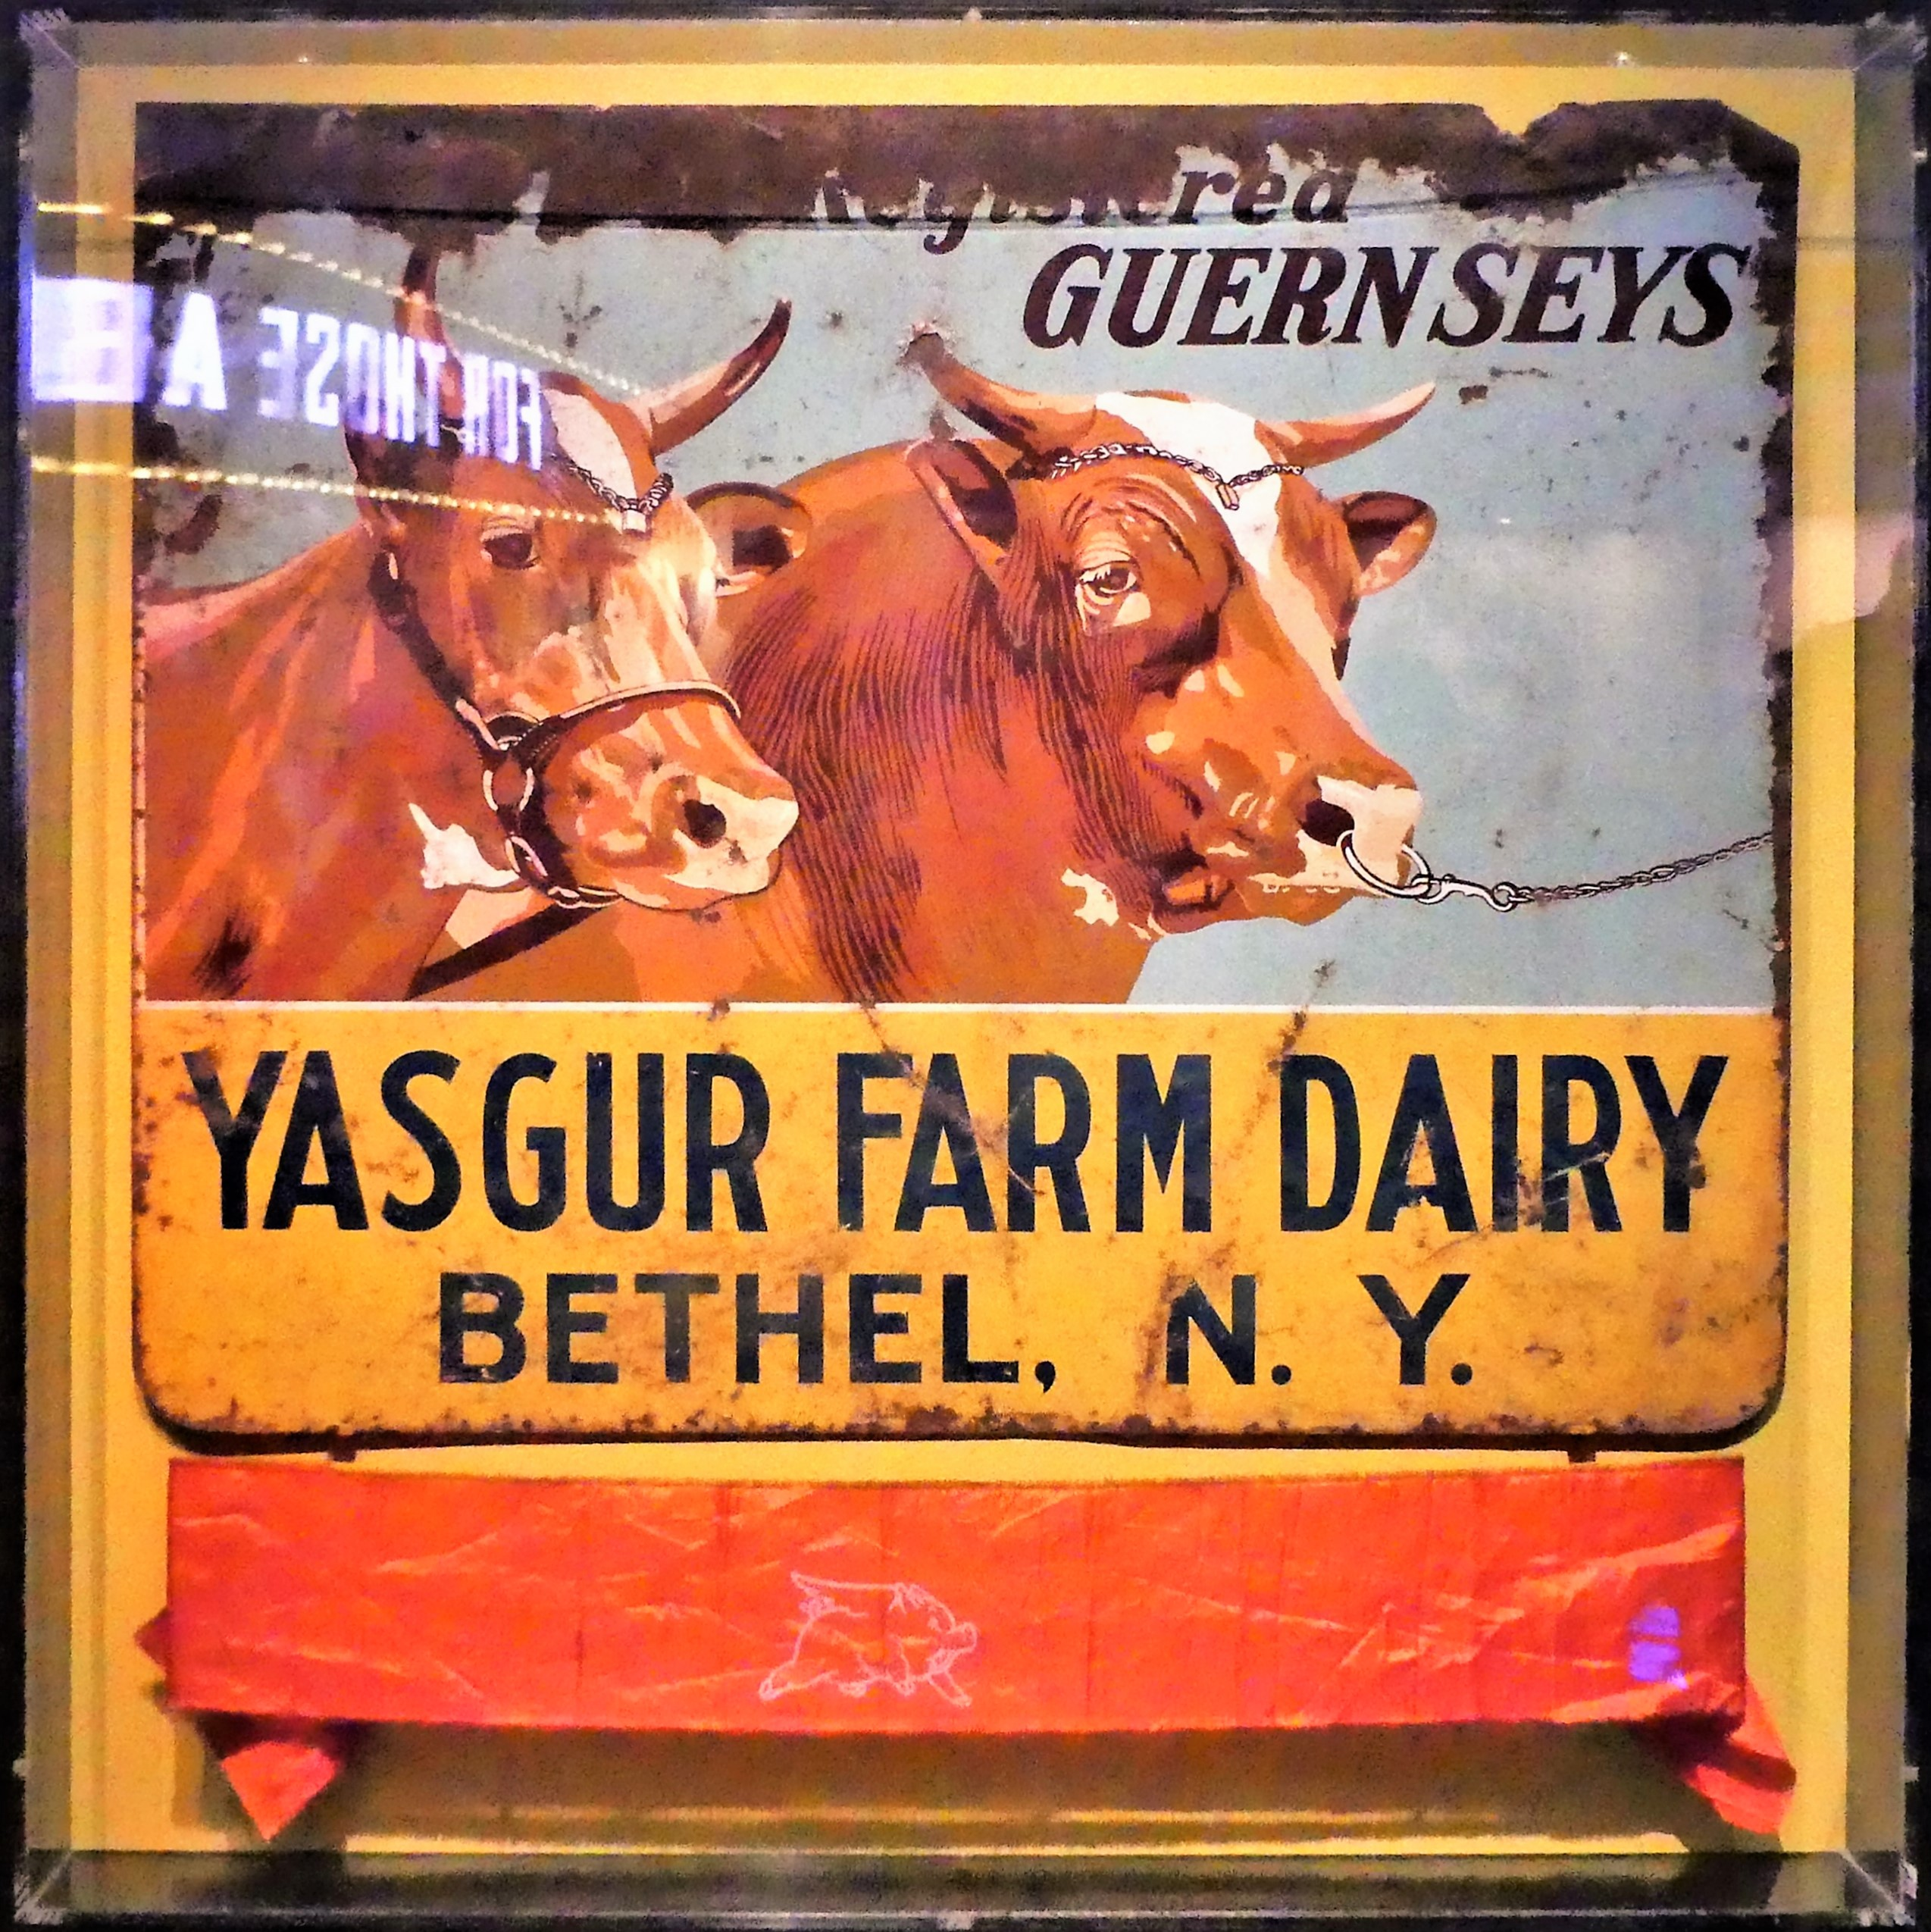 Yasgur Farm Dairy